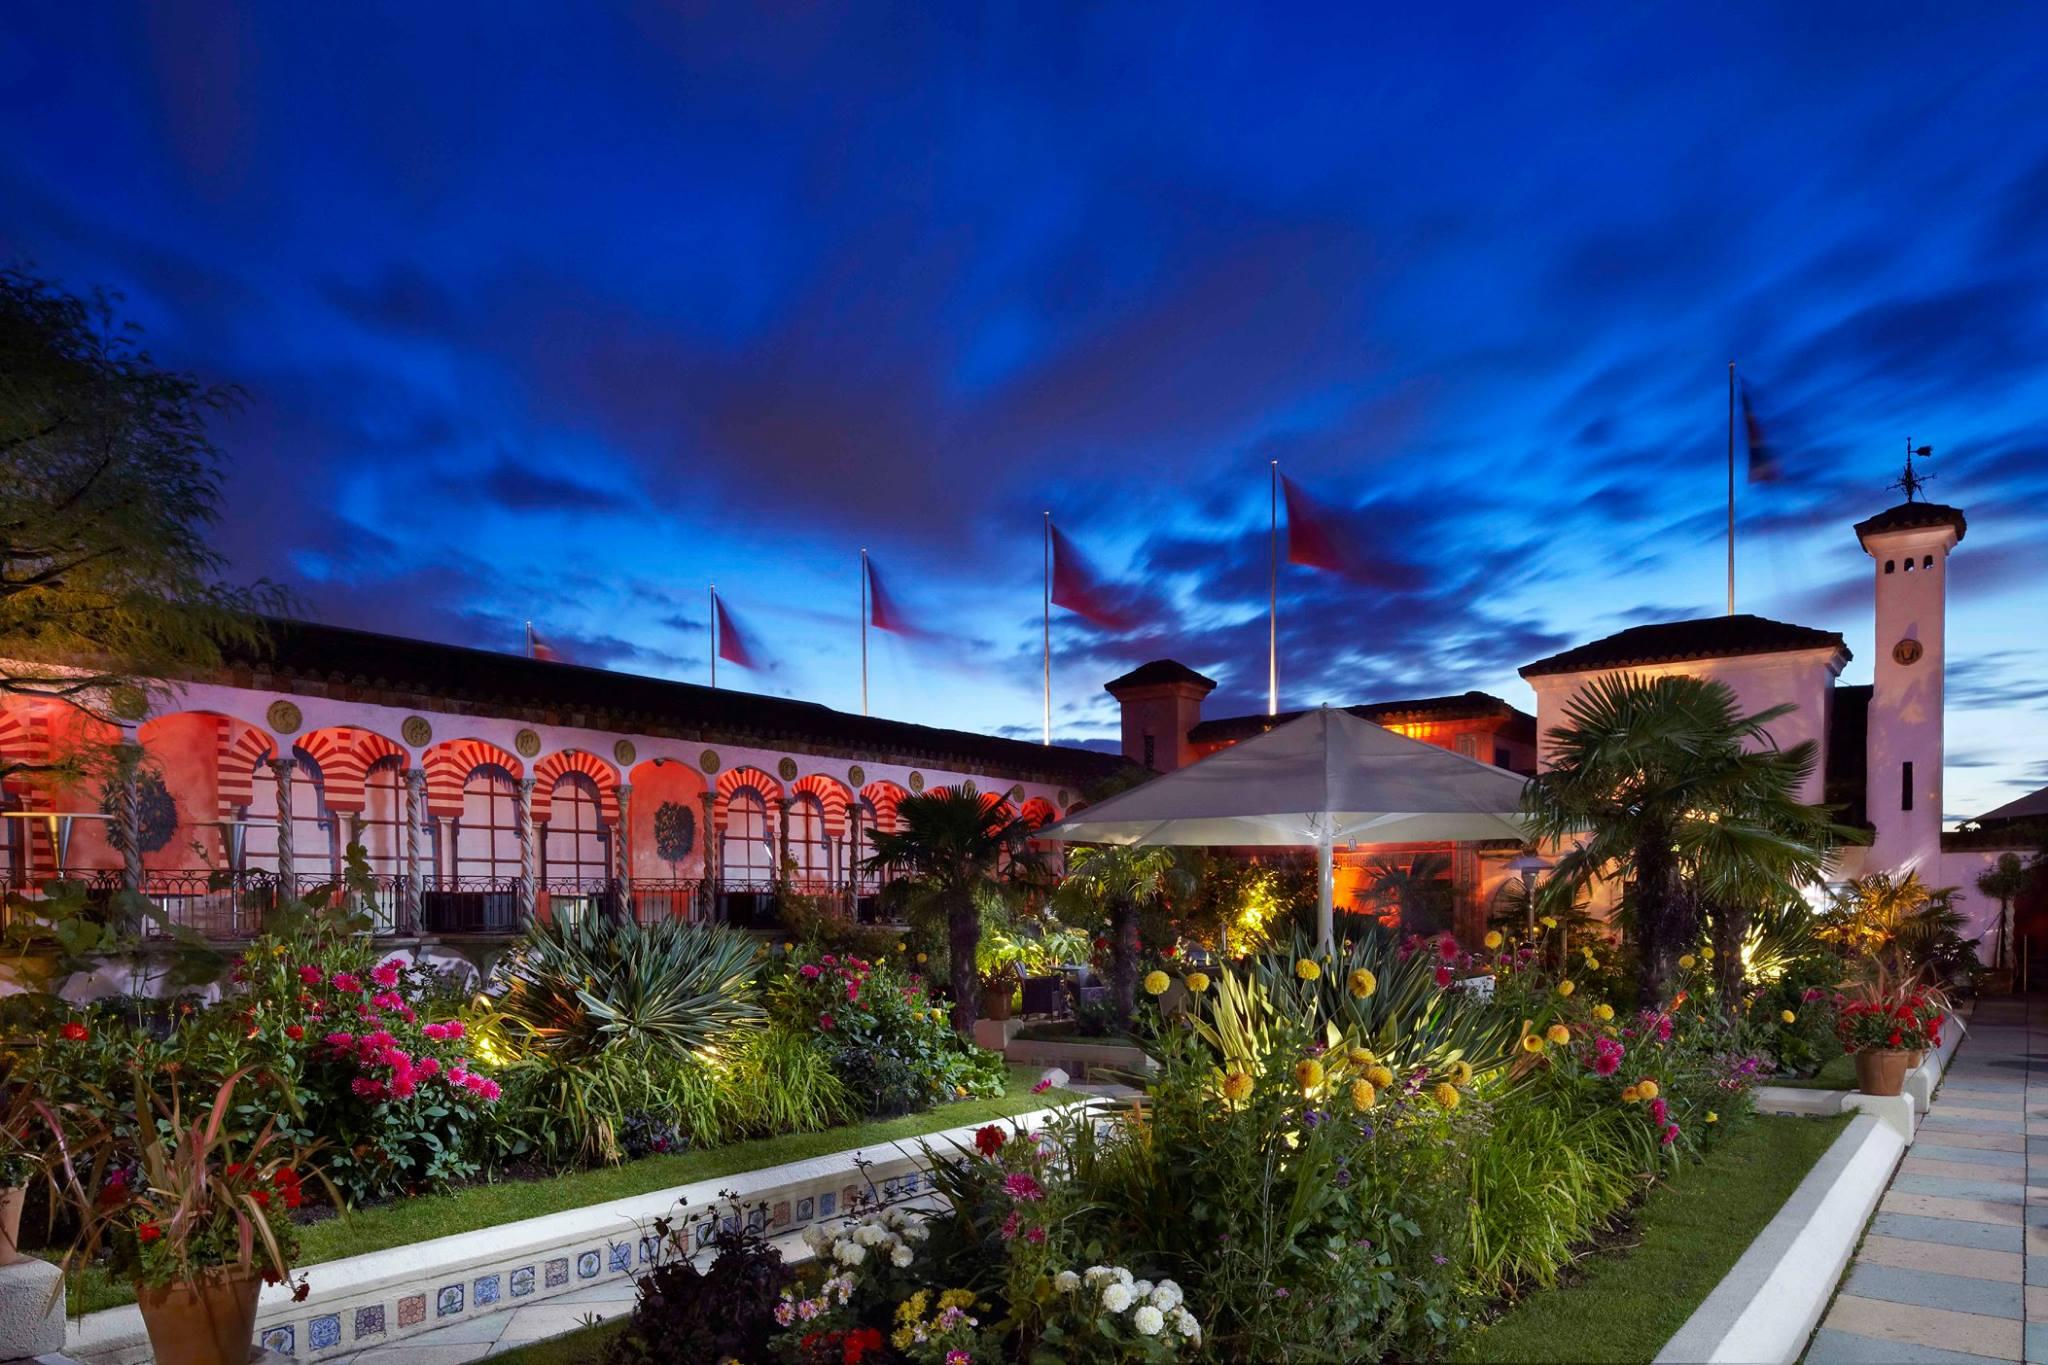 Roog Gardens sunset